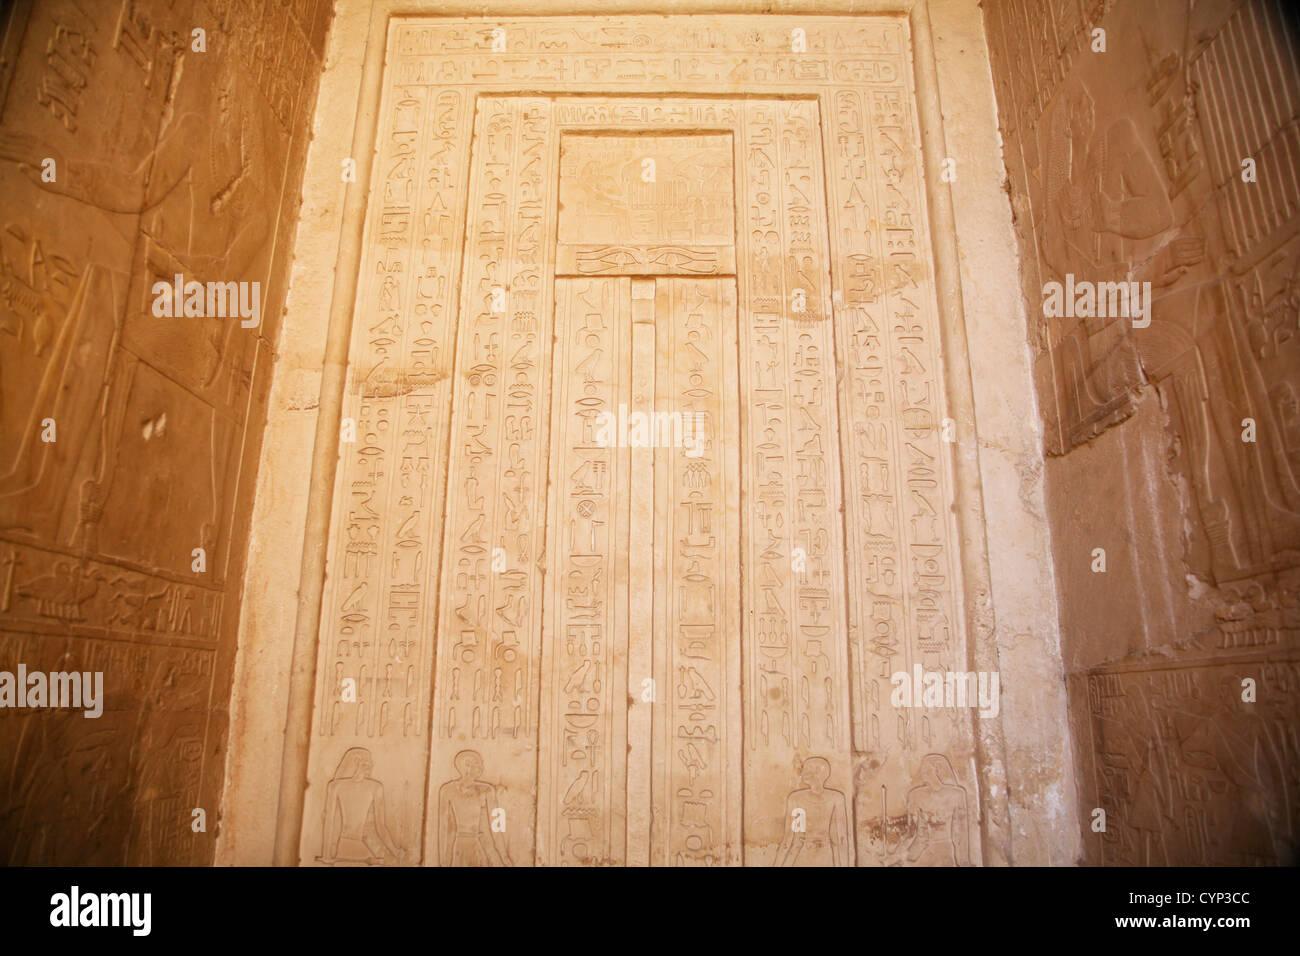 egyptian wall with hieroglyphic writings - Stock Image